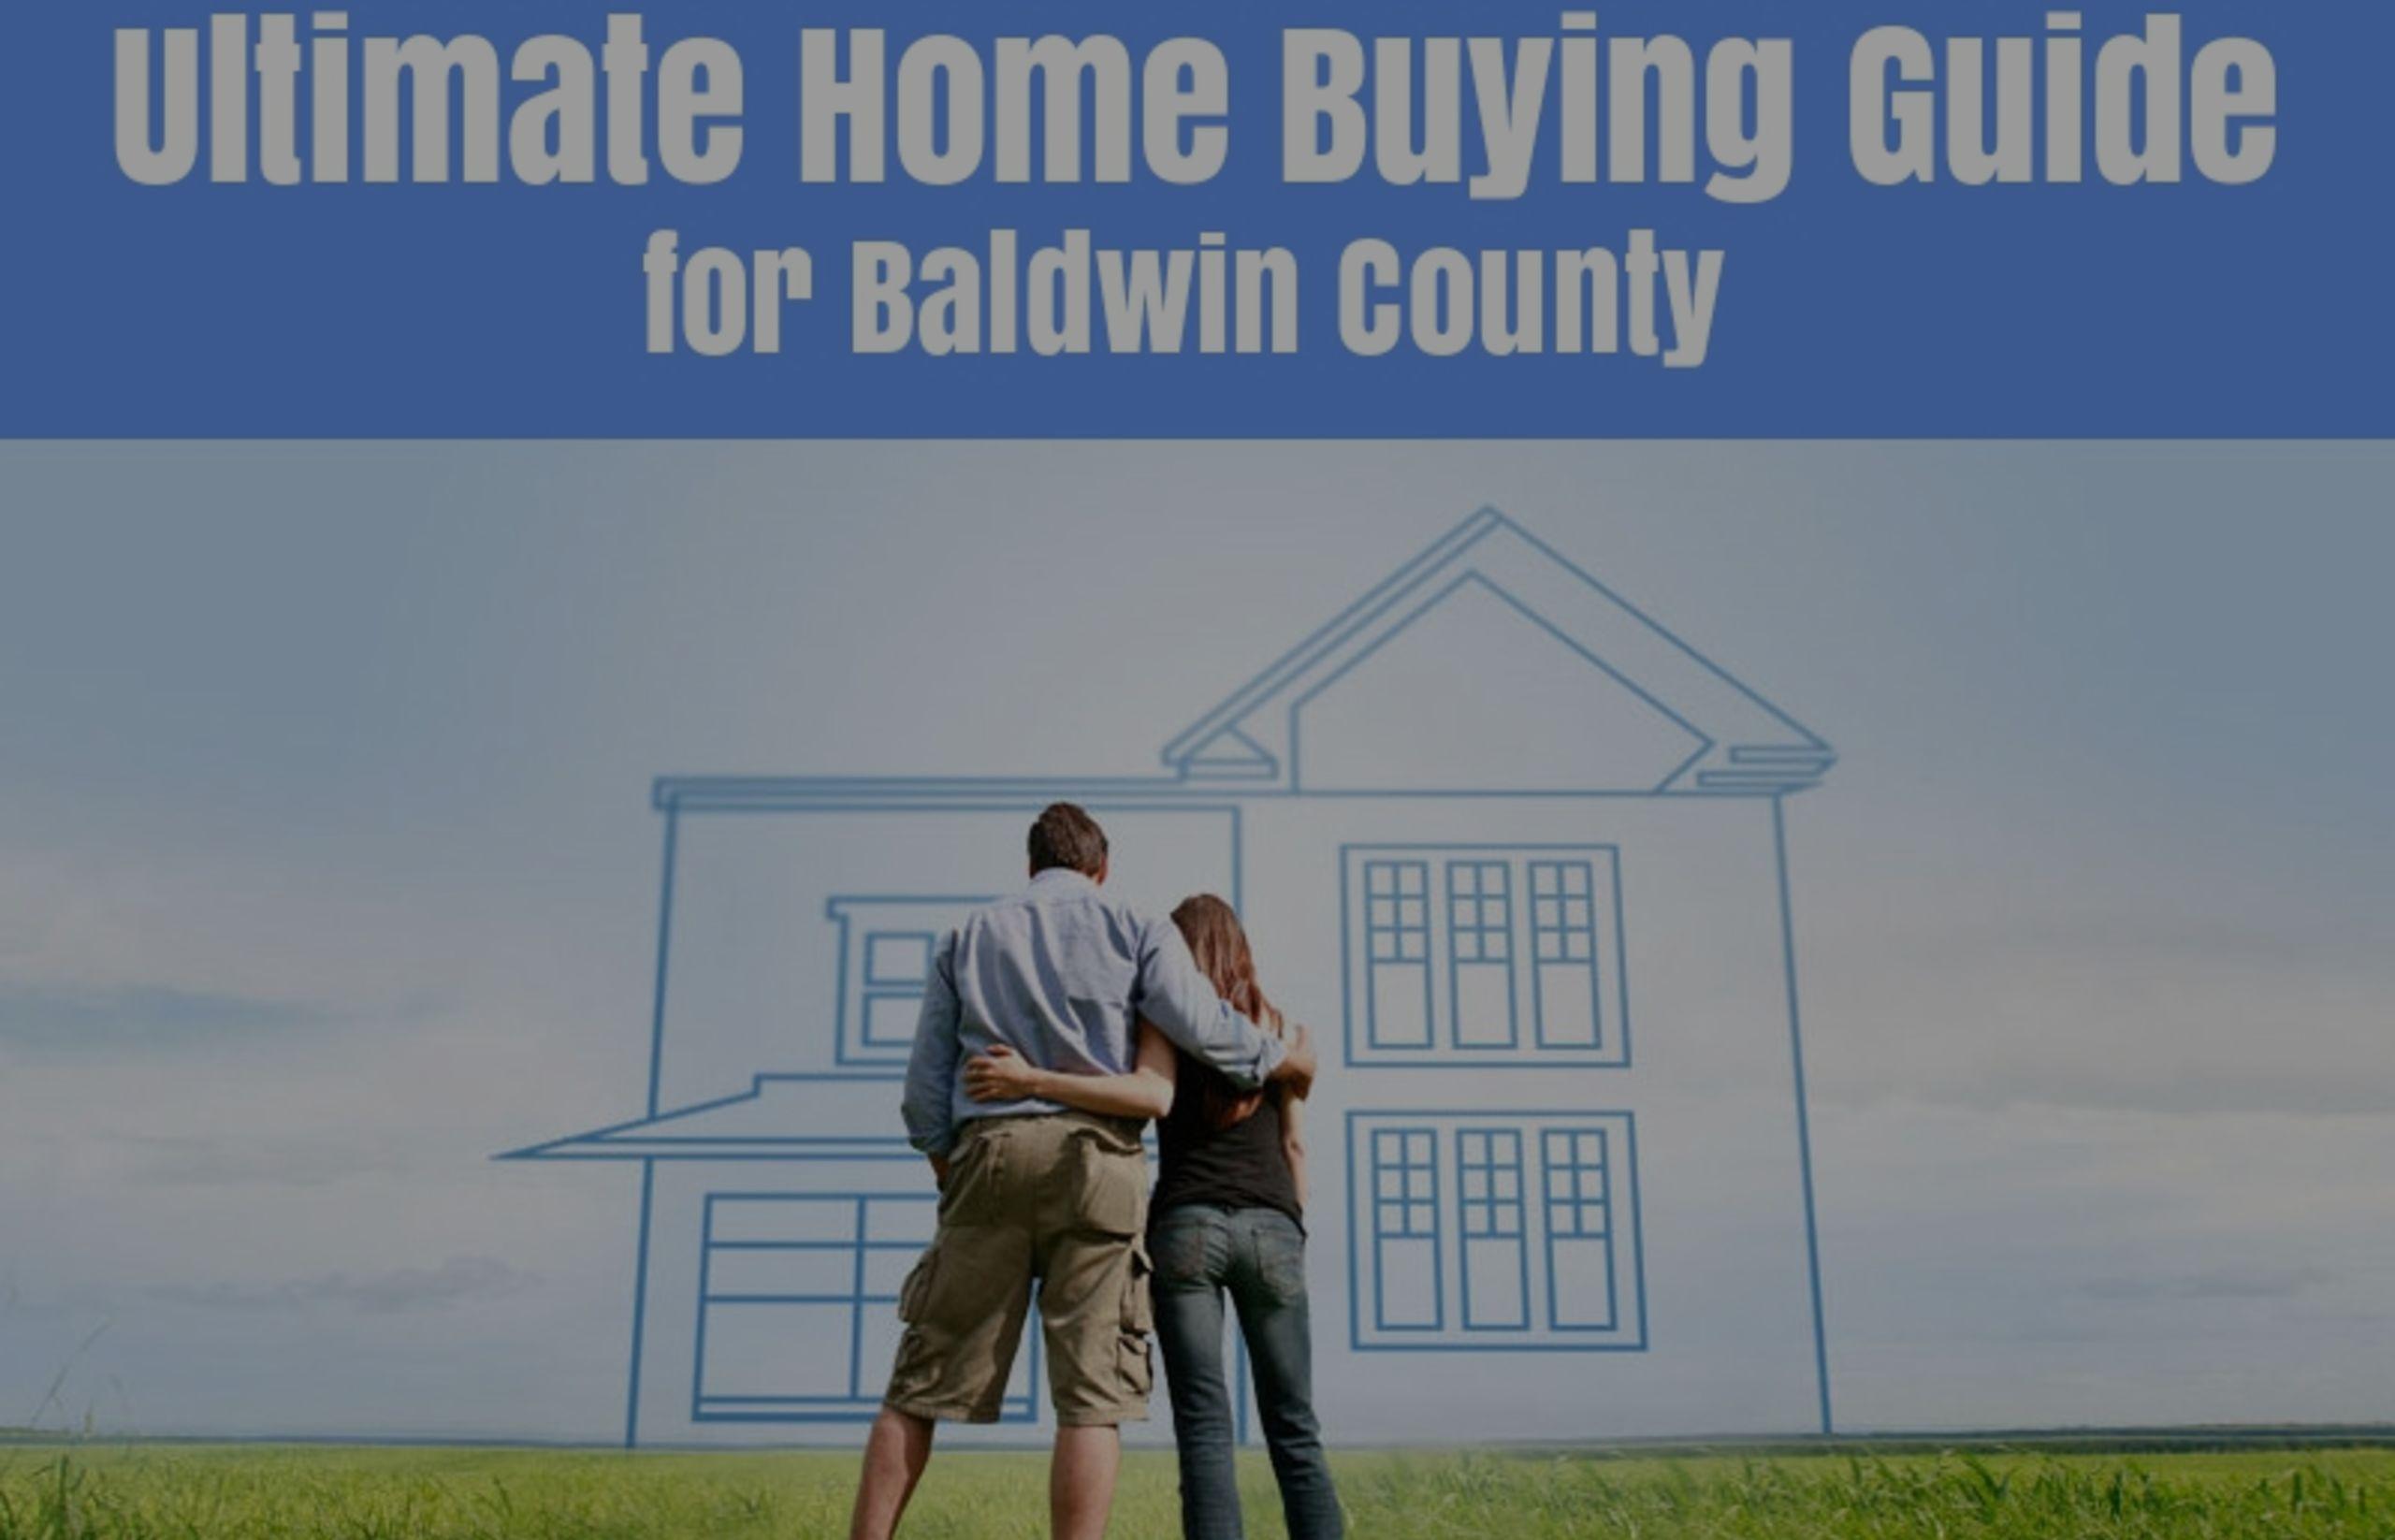 Ultimate Home Buying Guide – Baldwin County